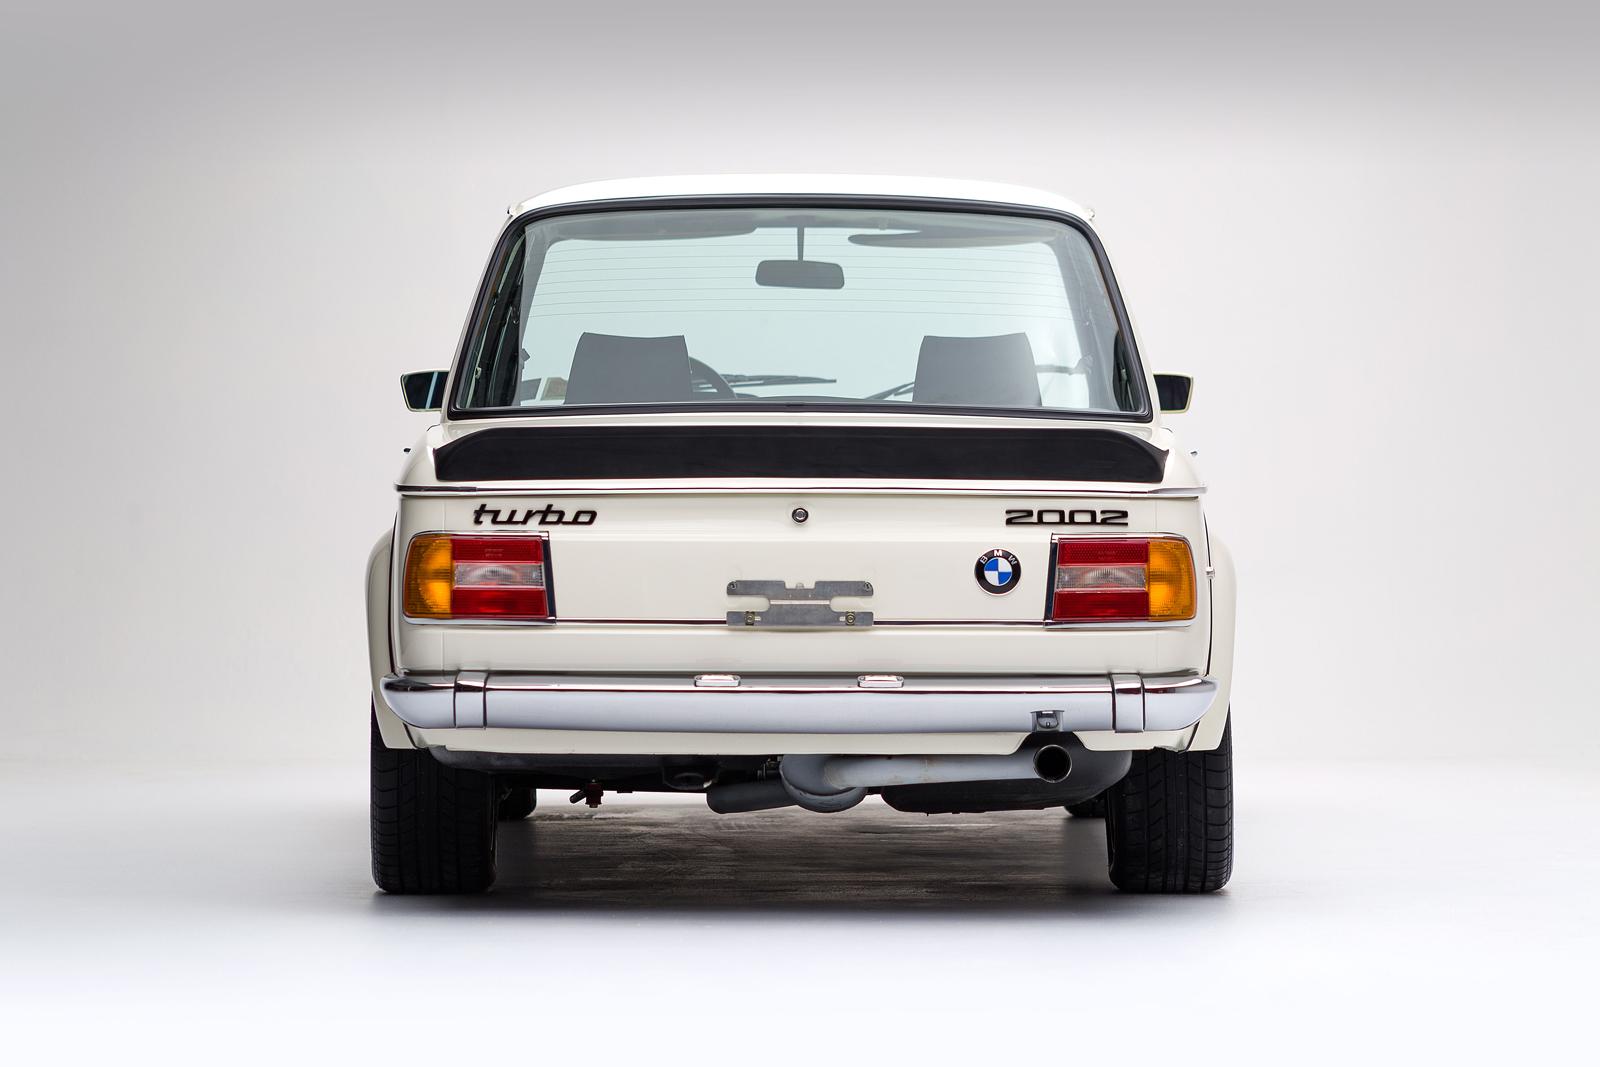 ClassicDotCom_BMW_2002_Turbo_03.jpg